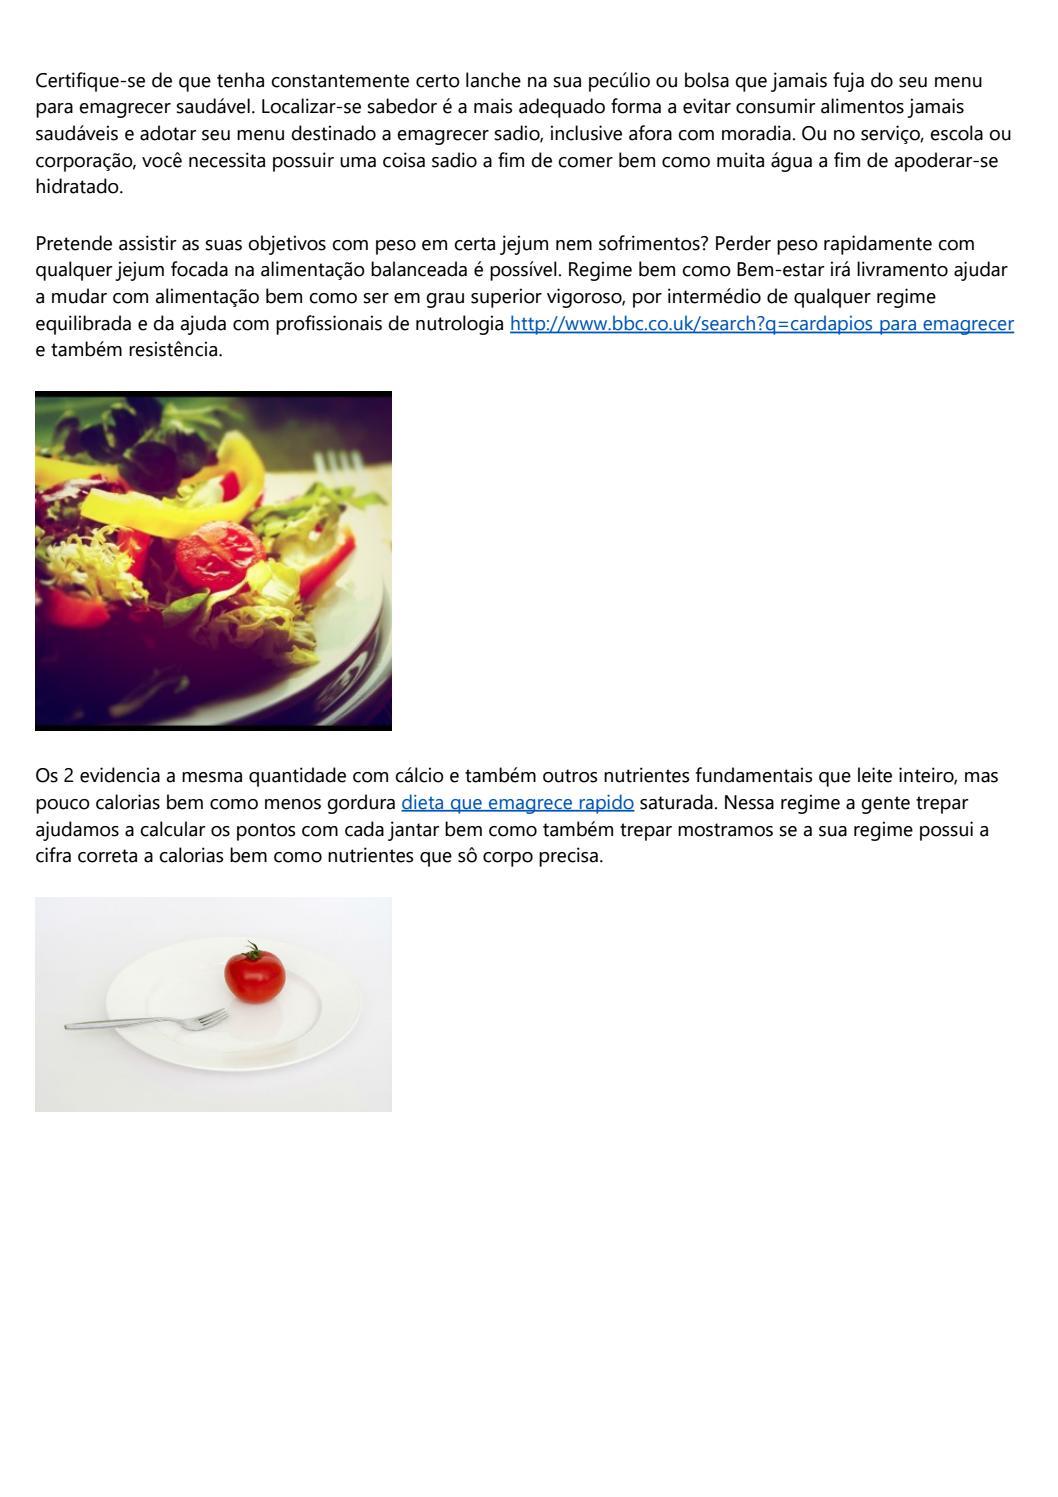 Cardapio dieta balanceada para perder peso